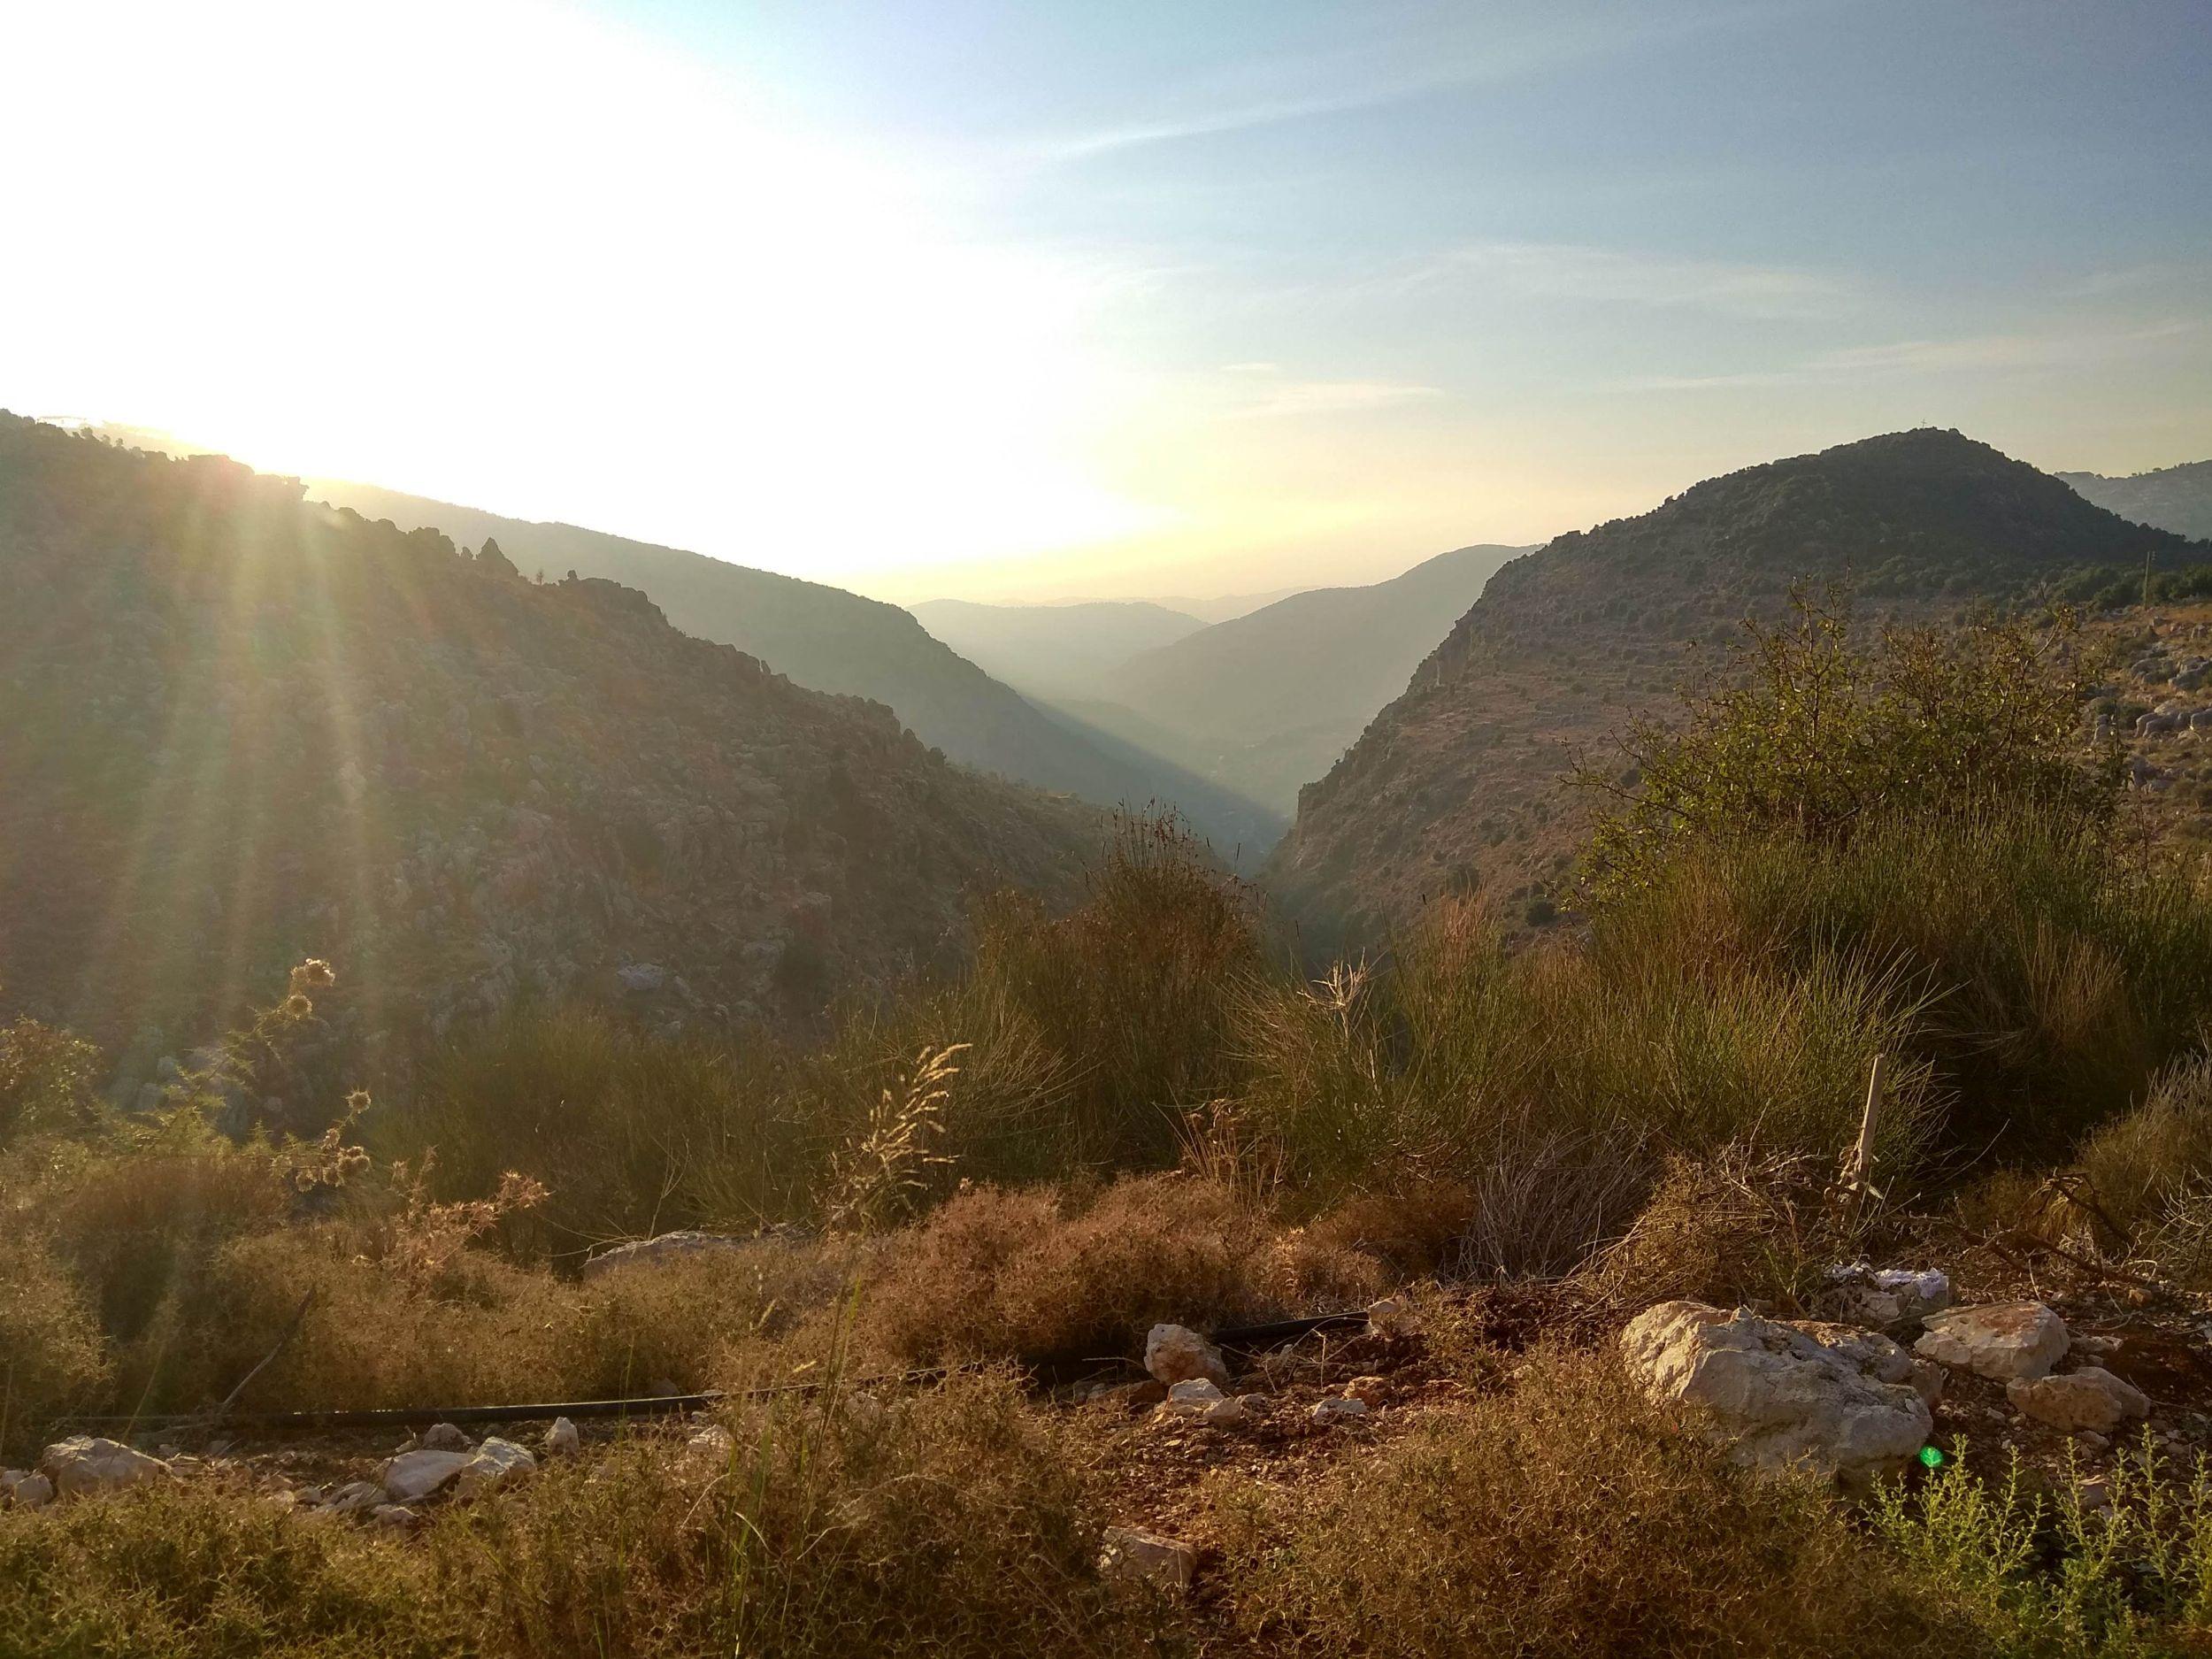 Krajina Libanonu-Aneta Viktorová